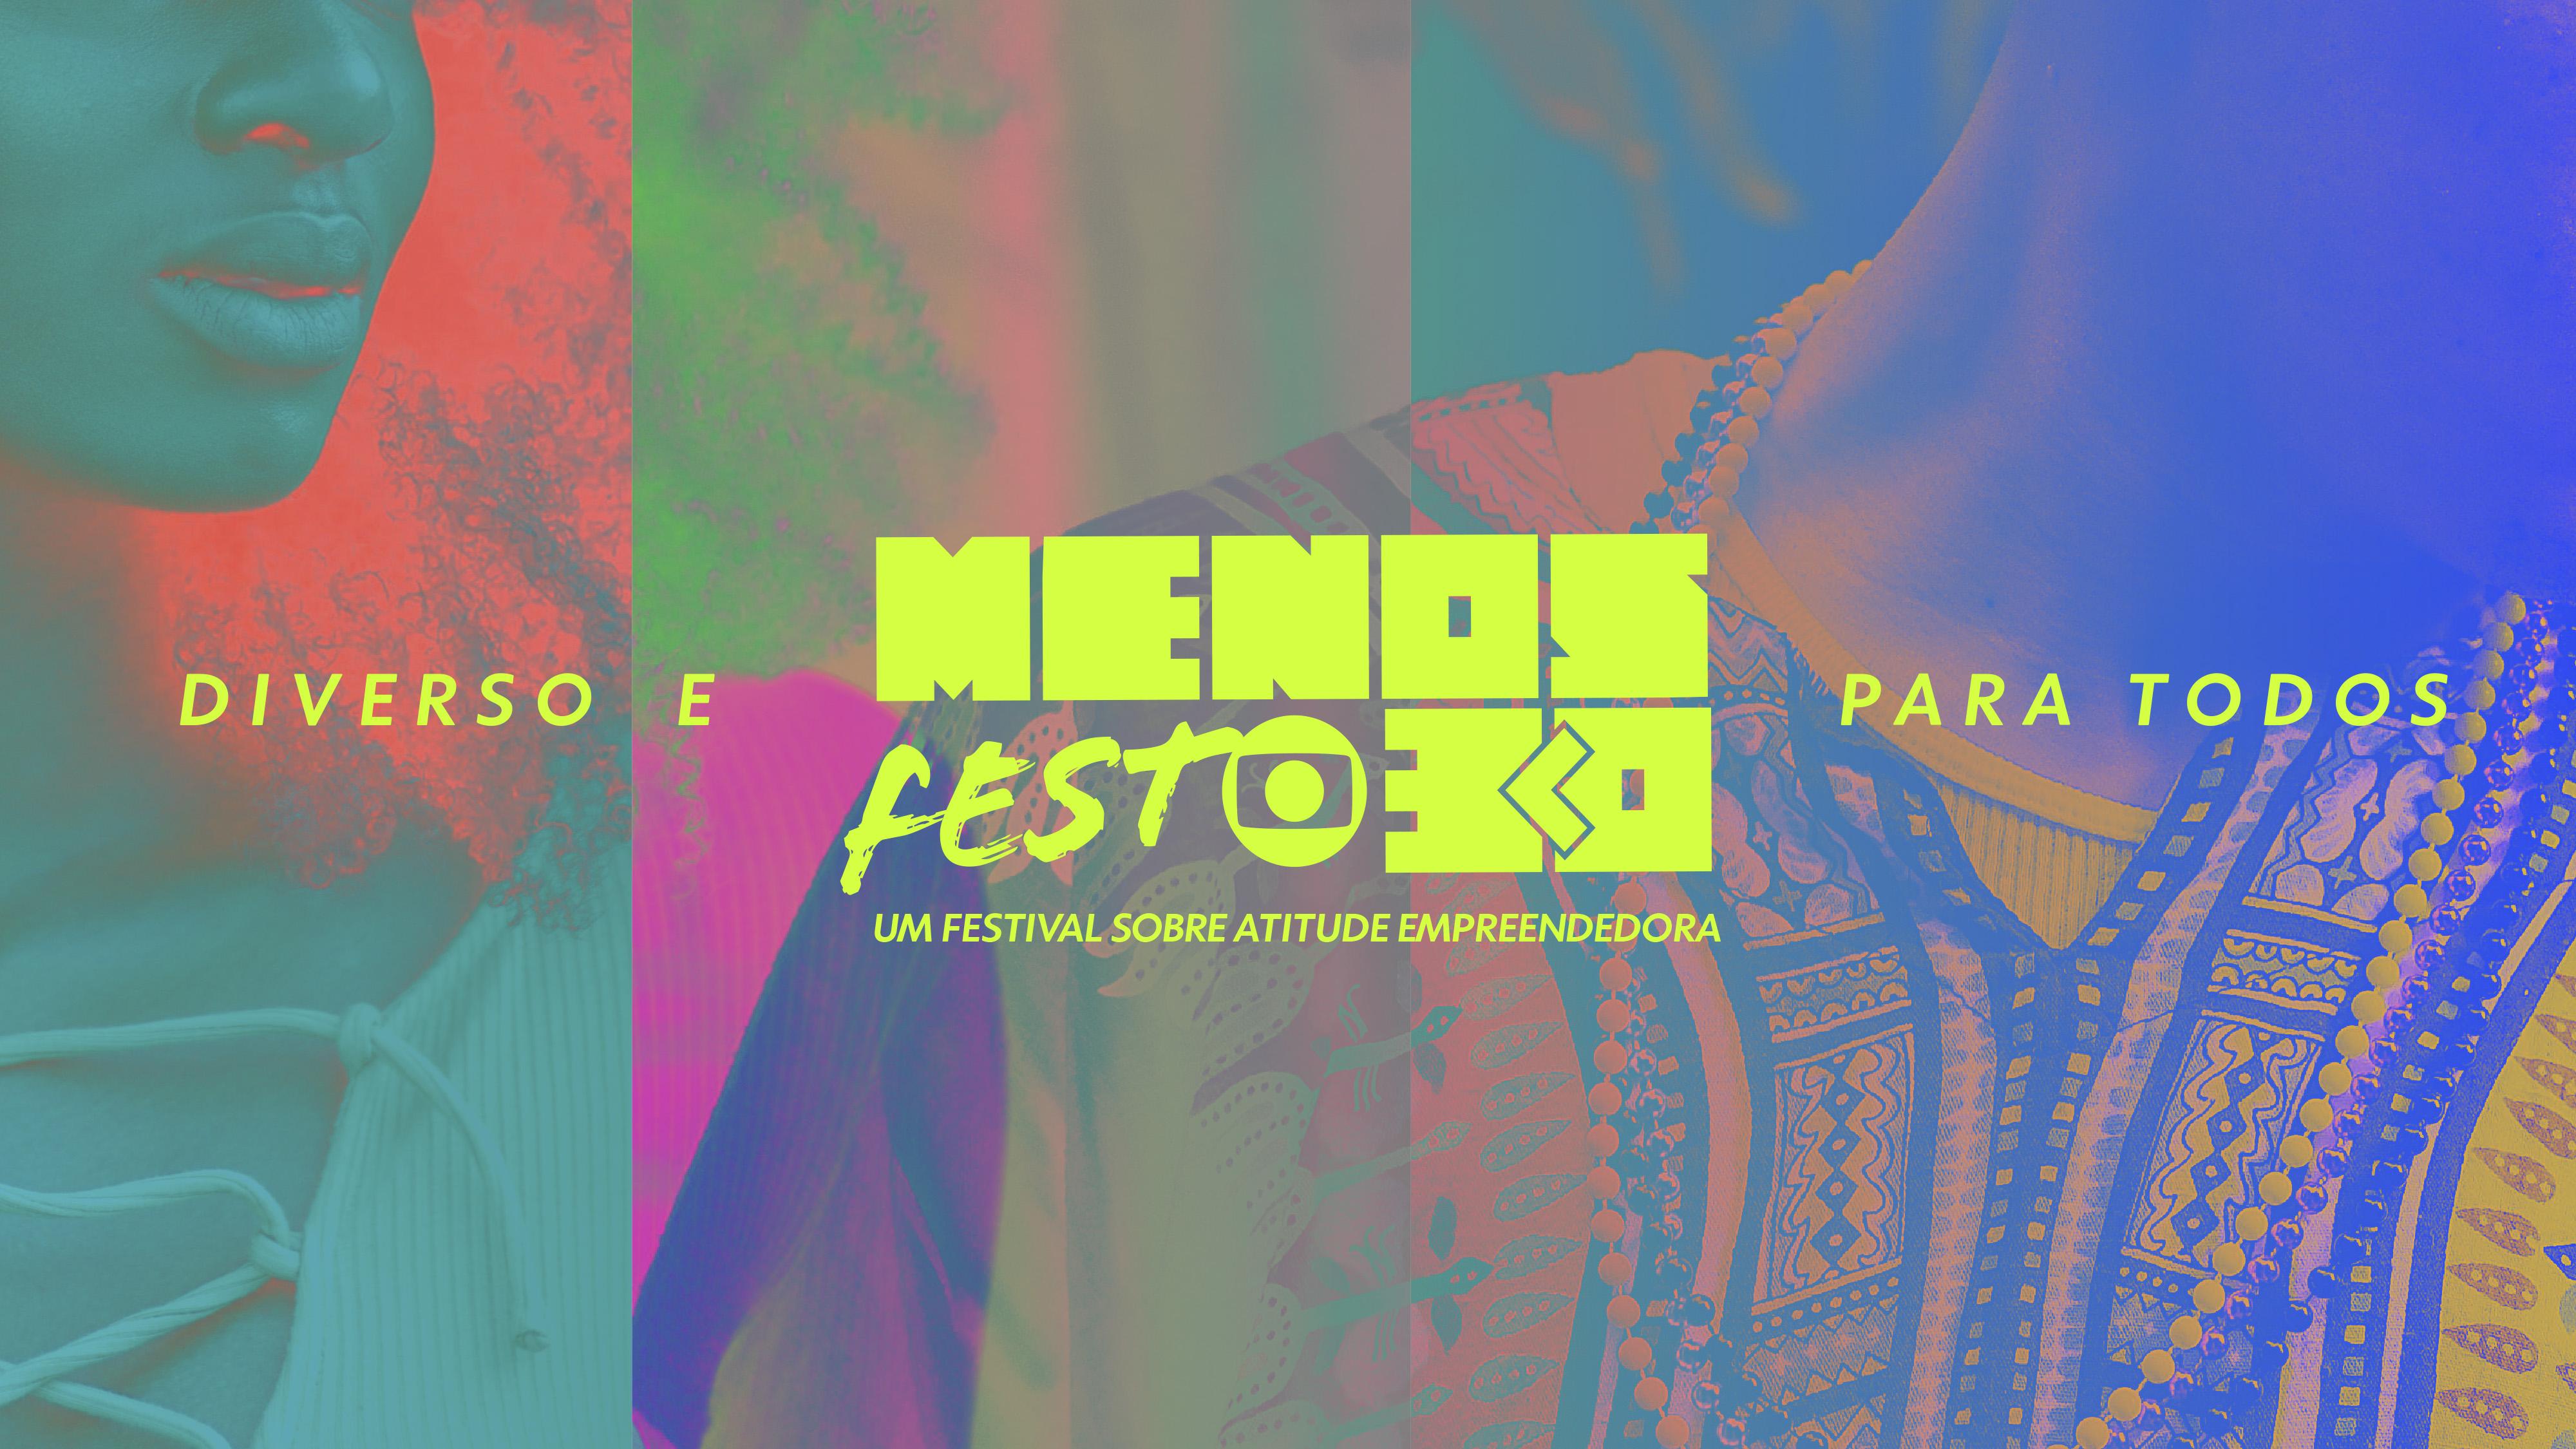 Menos 30 Fest - Banner de internet-1920x1080 B